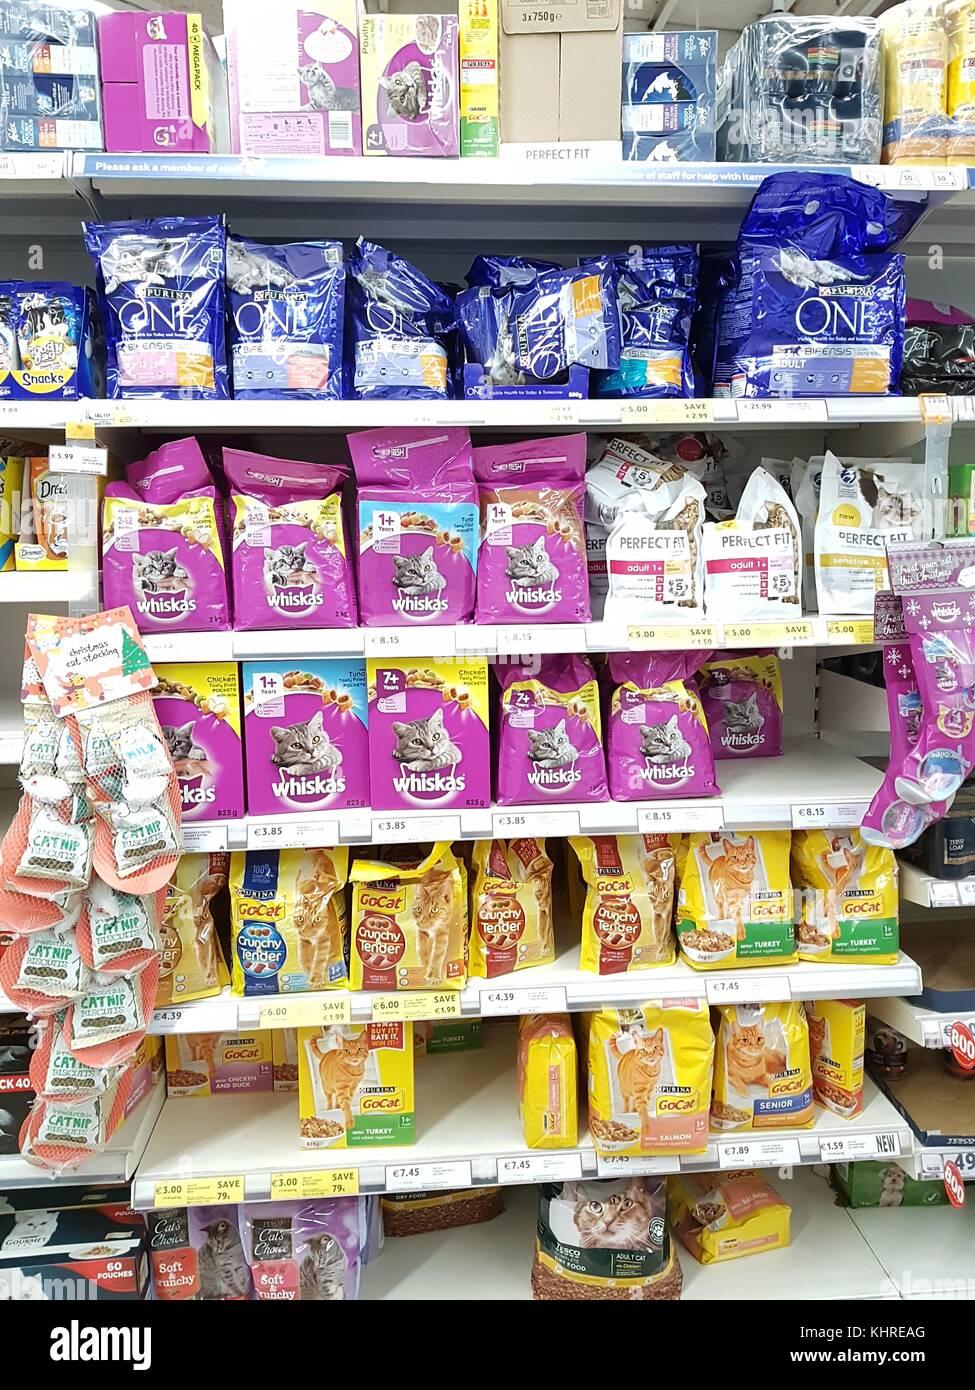 Ennis Ireland Nov 17th 2017 Tesco Store In Ennis County Clare Stock Photo Alamy